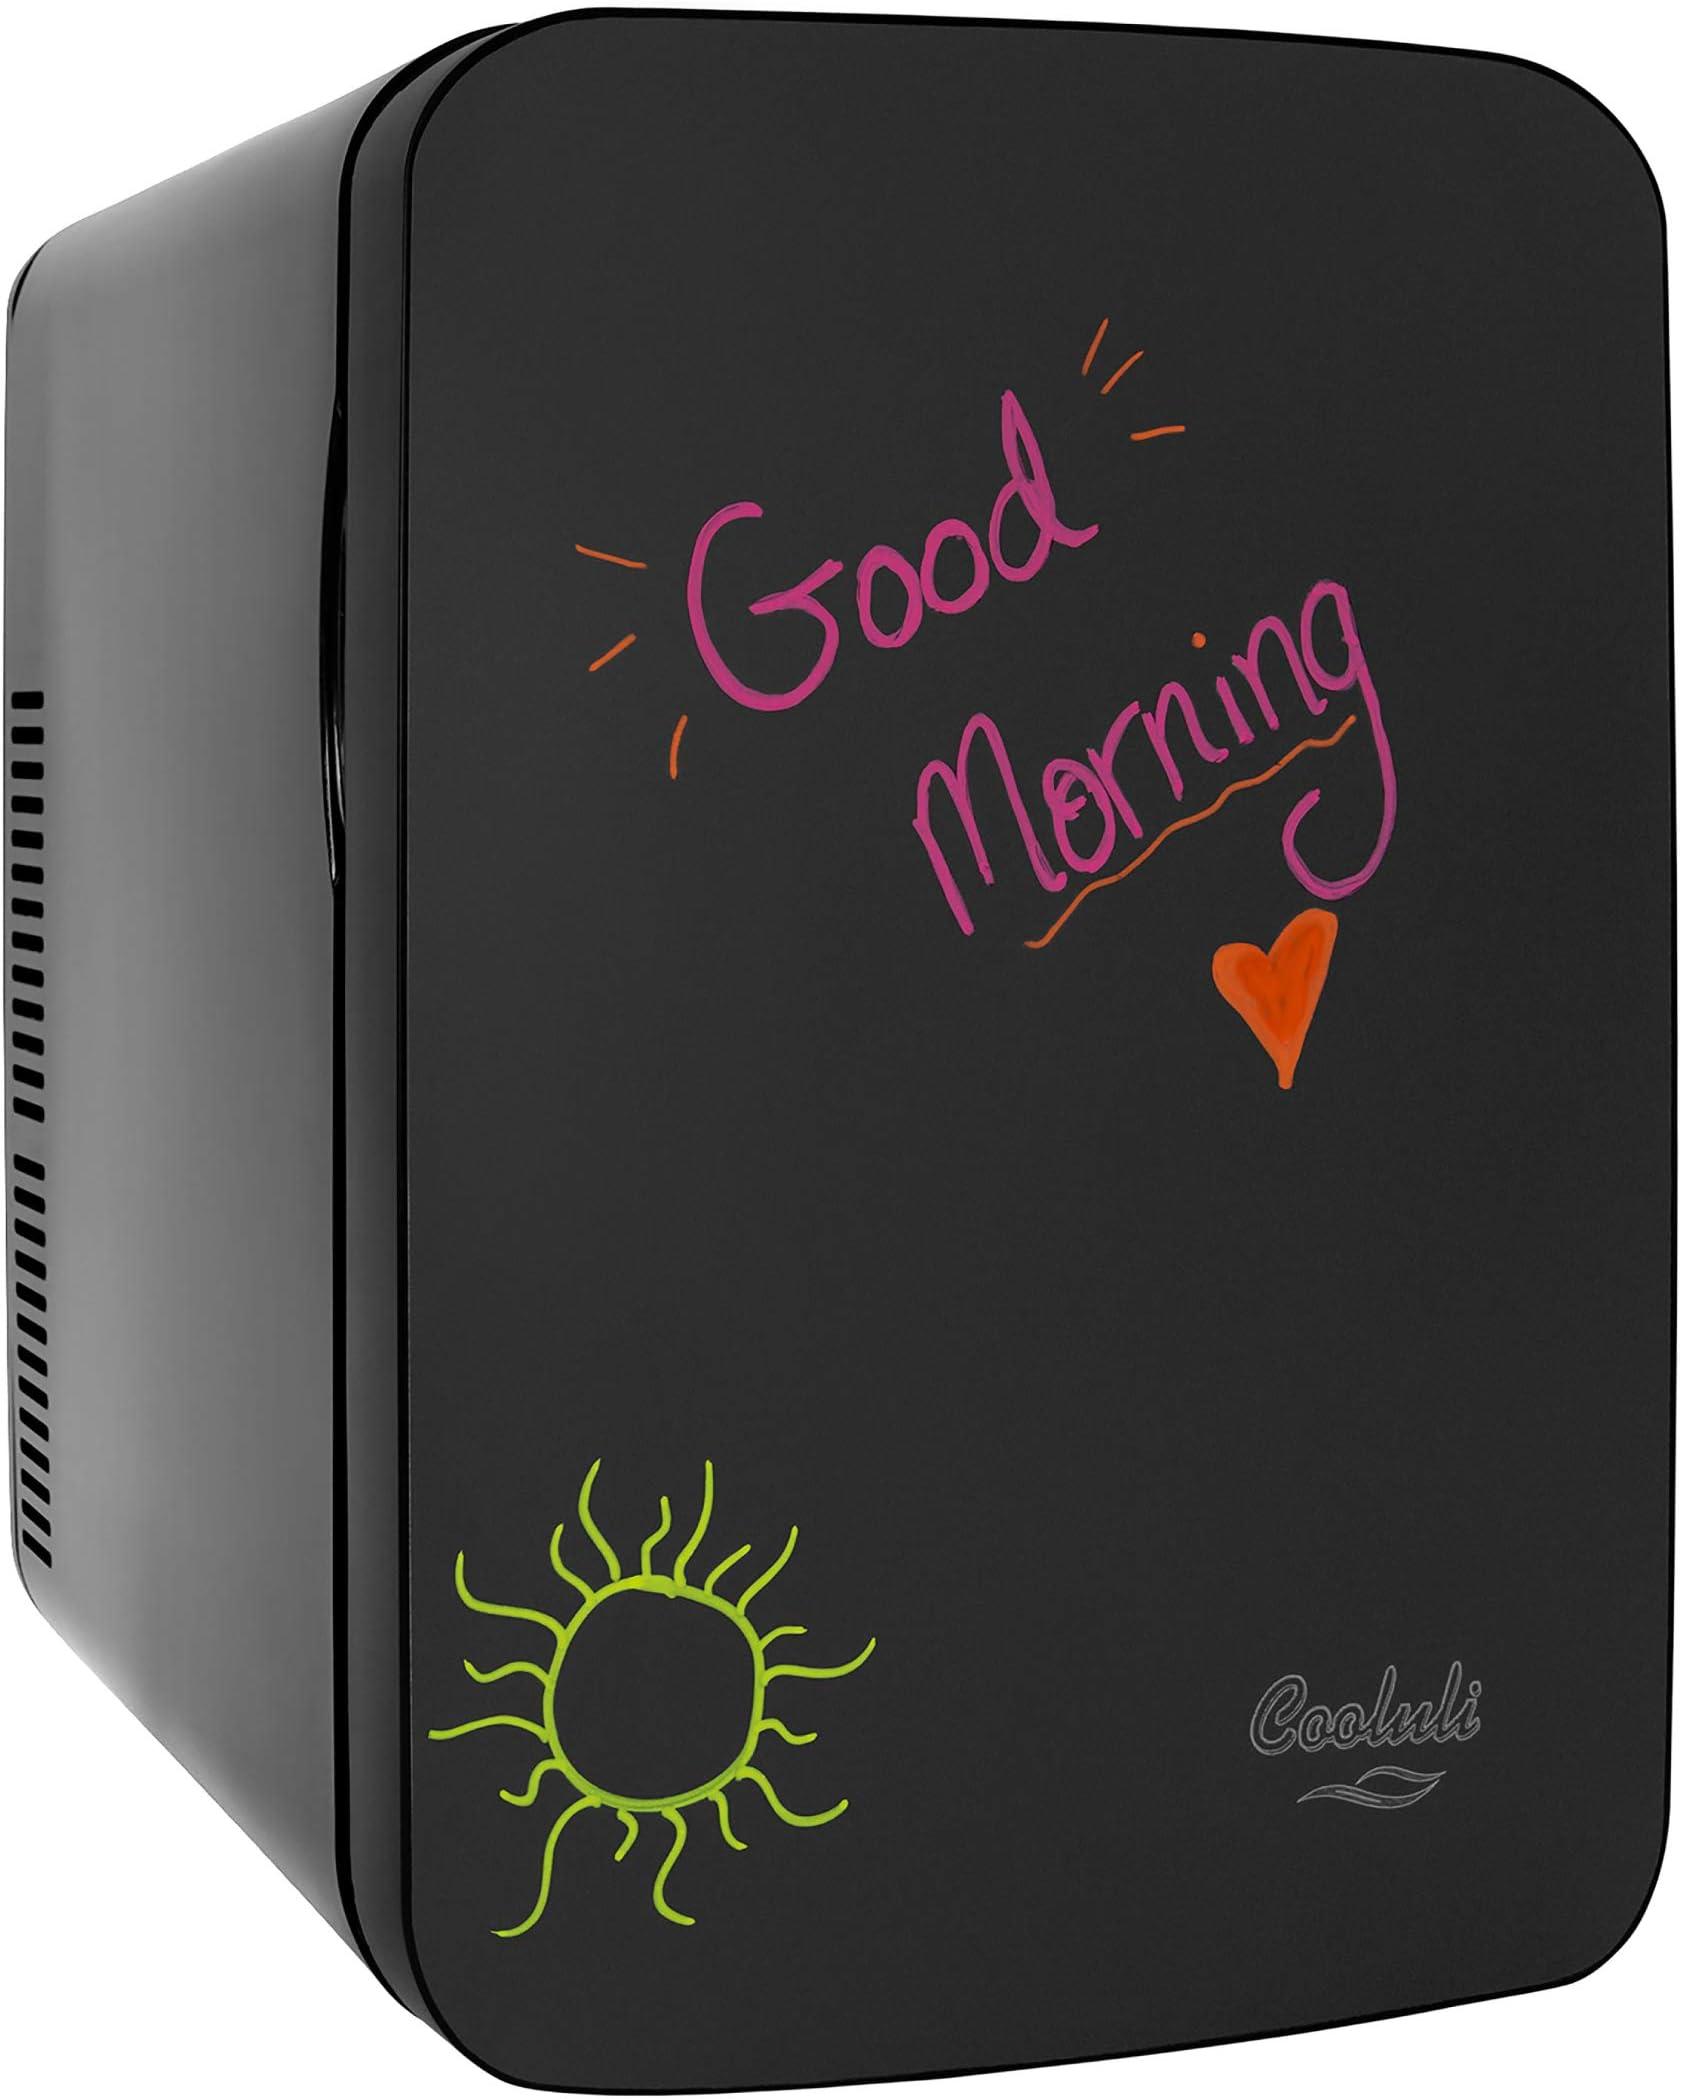 Cooluli Vibe Black 40 Liter Compact Portable Cooler Warmer Blackboard Mini  Fridge for Bedroom, Office, Dorm, Car   Great for Skincare & Cosmetics ...